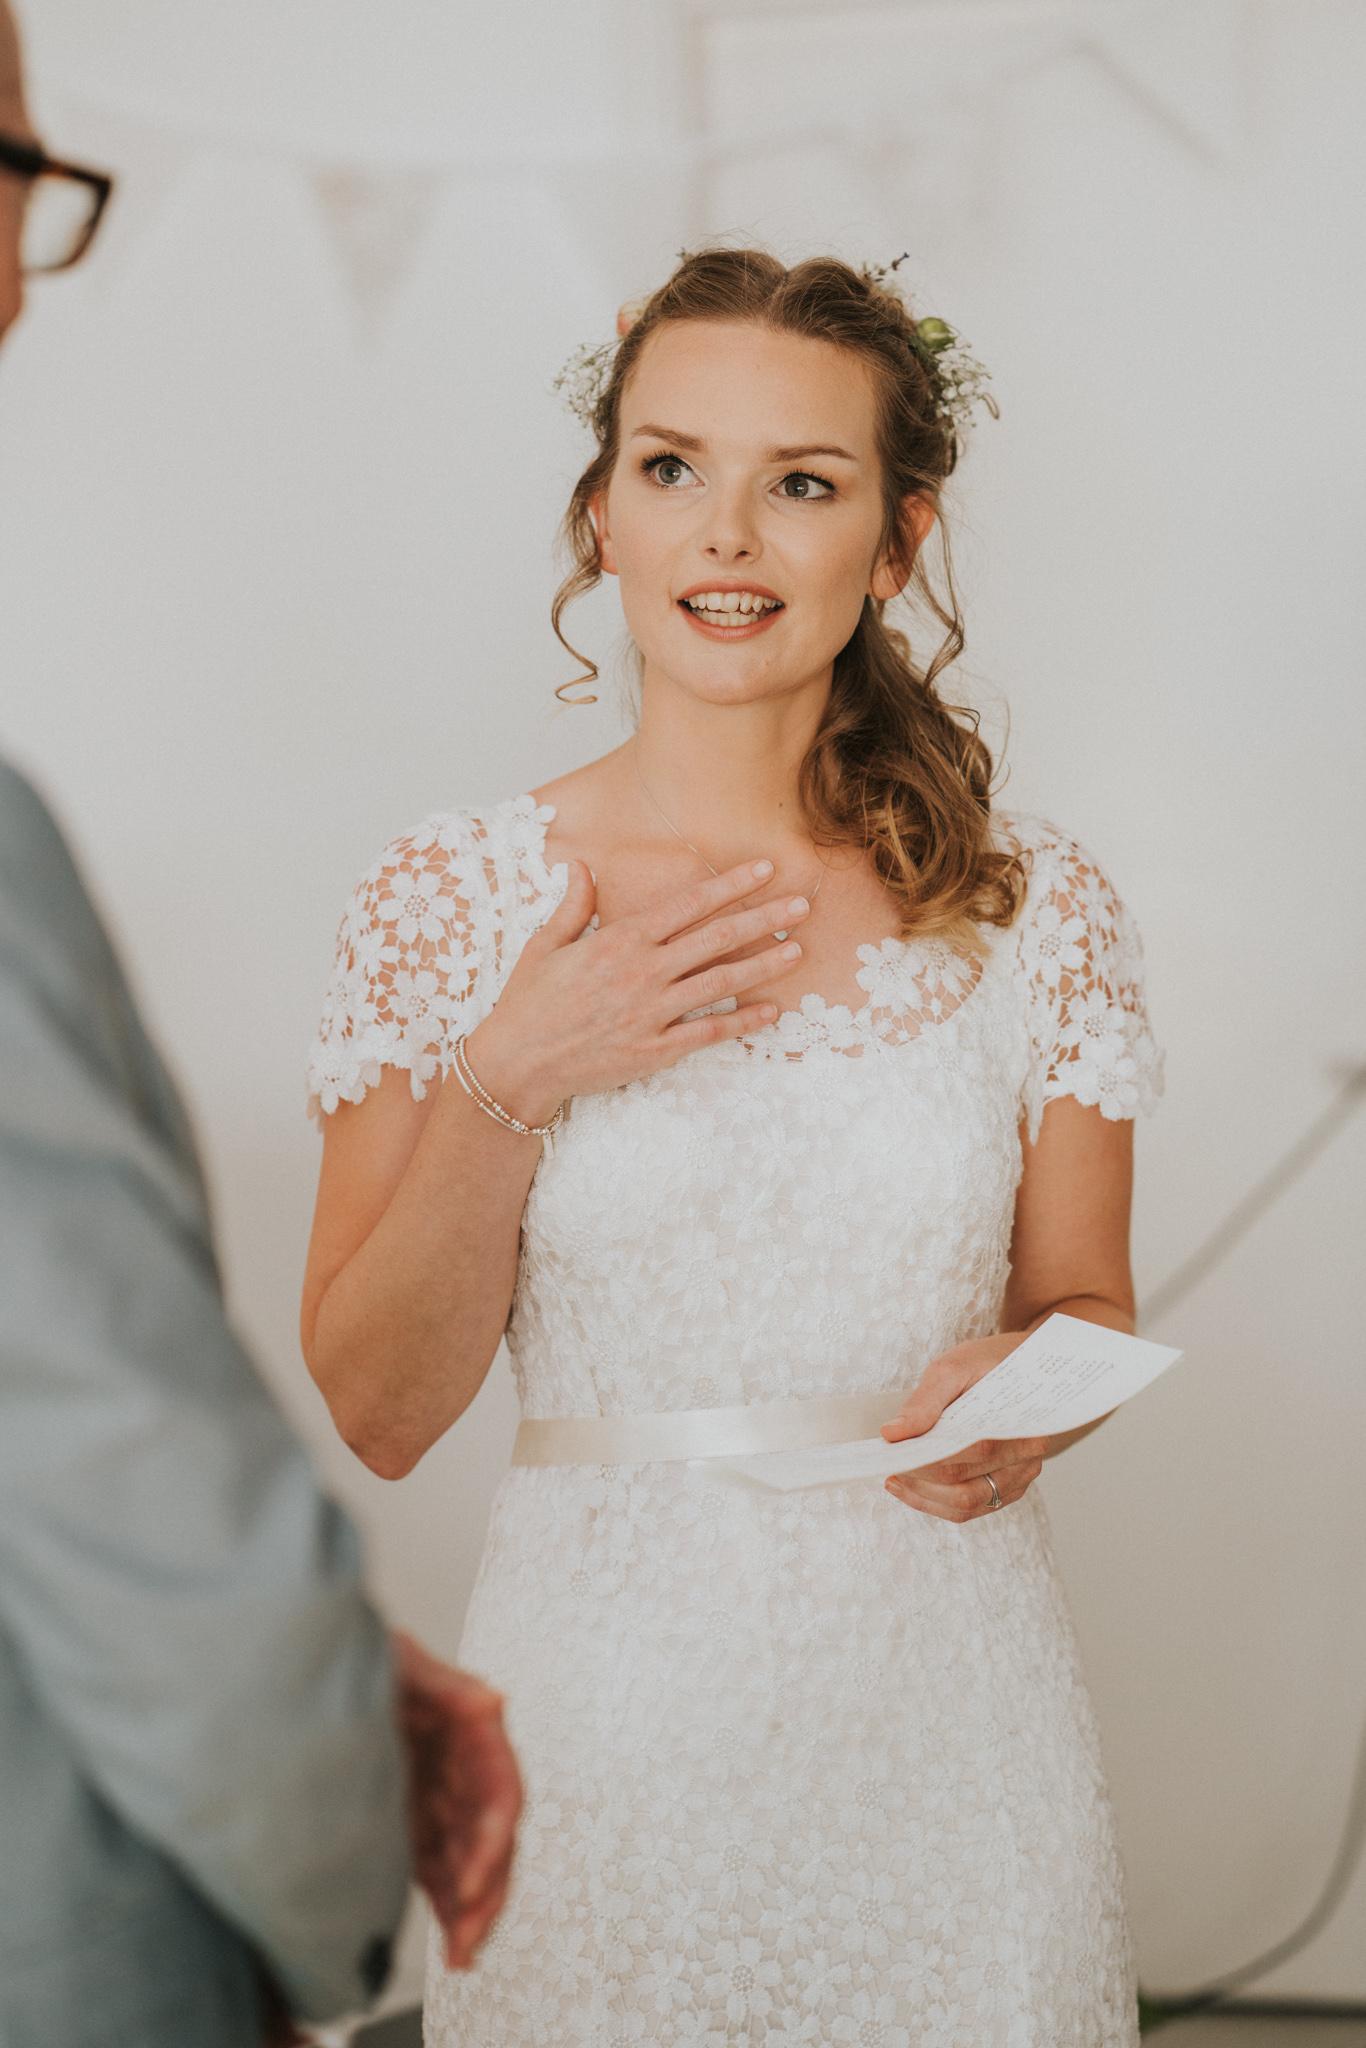 Grace-Elizabeth-Georgie-Amalaketu-Firstsite-Colchester-Essex-Boho-Buddhist-Wedding-Alternative-Wedding-Photography-Essex (56 of 100).jpg